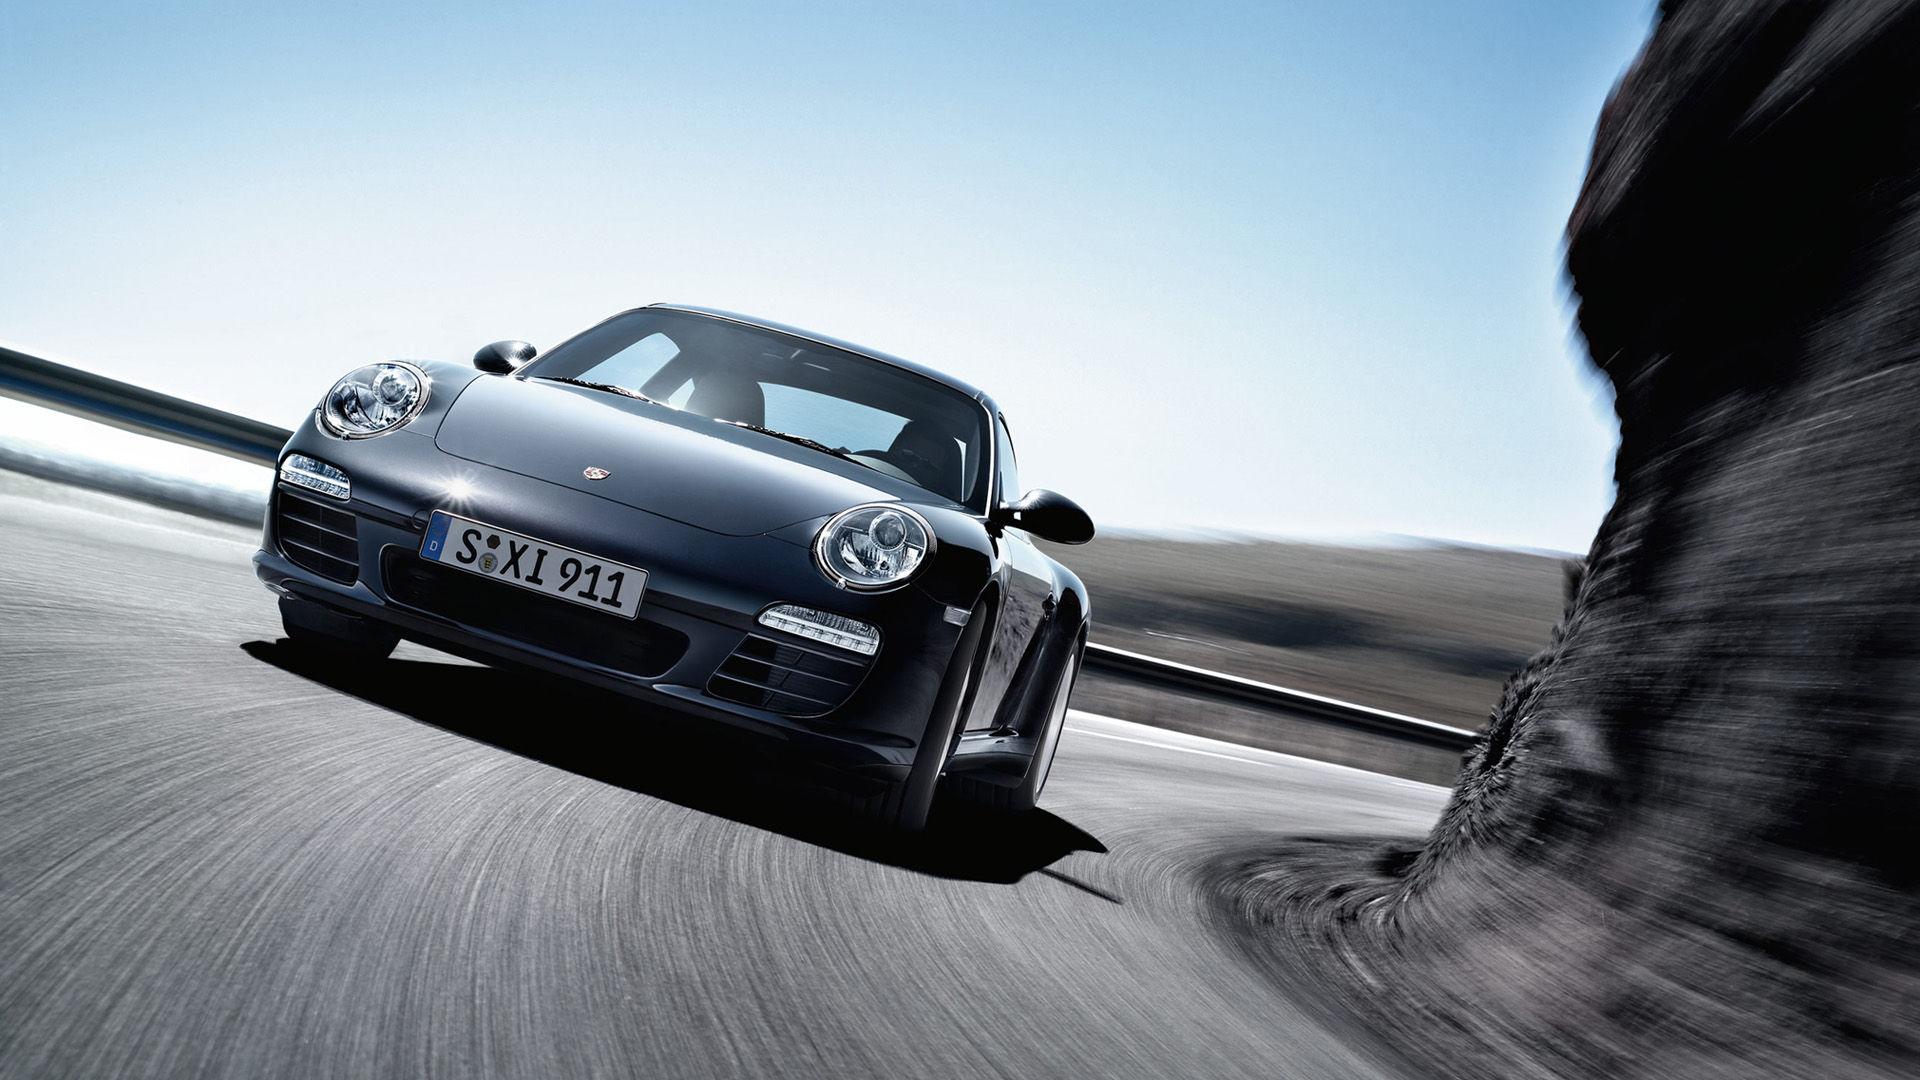 2010 Porsche 911 Carrera 4